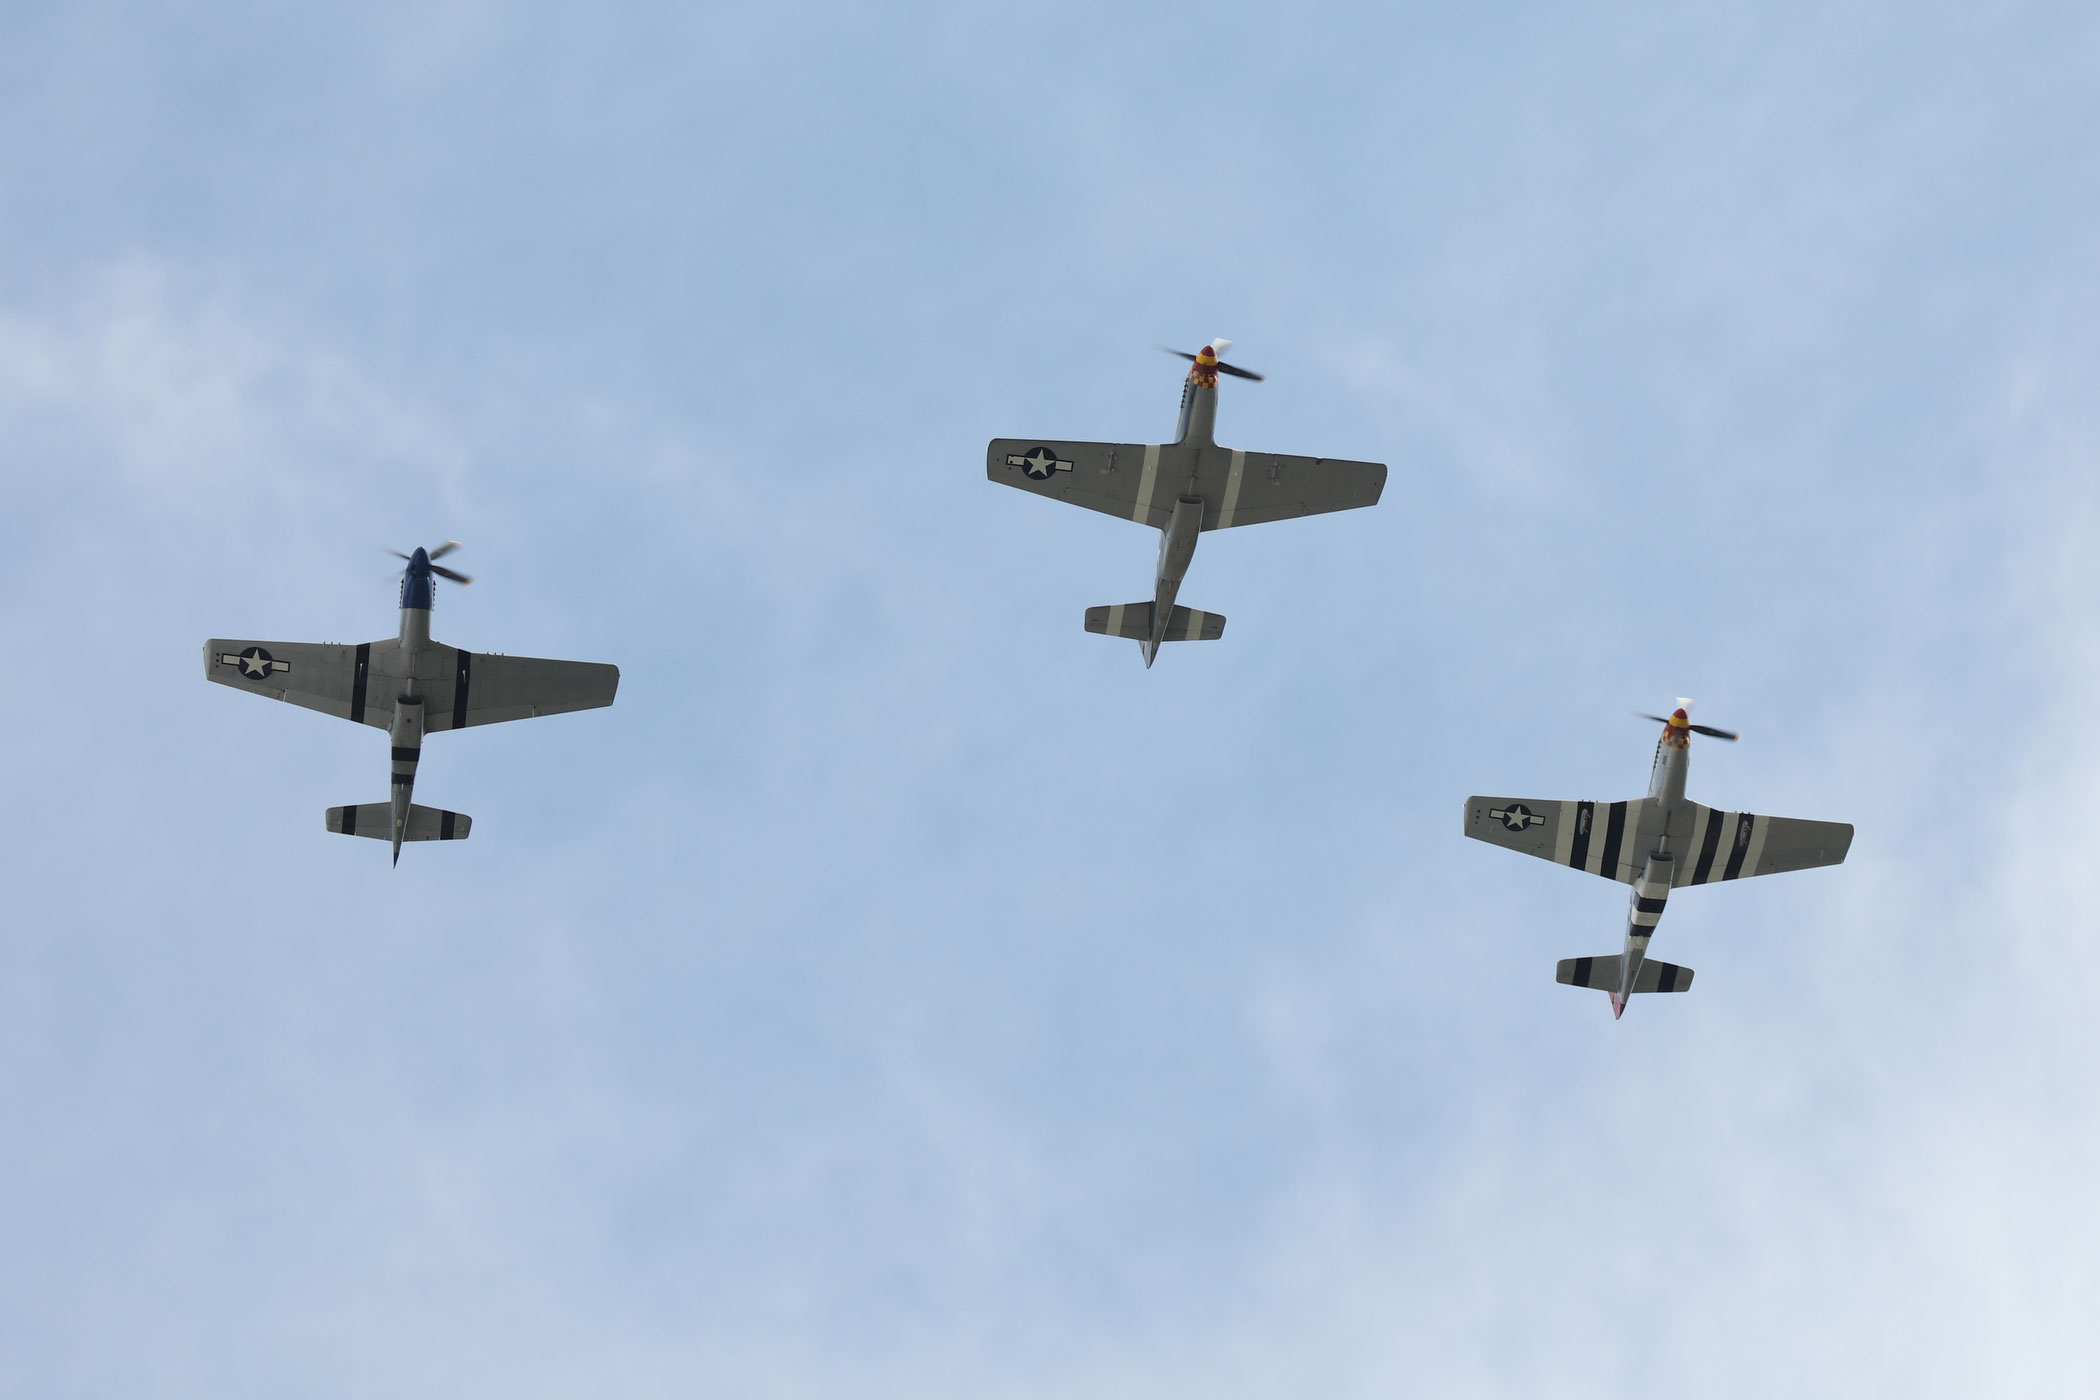 P51 Mustang planes overhead